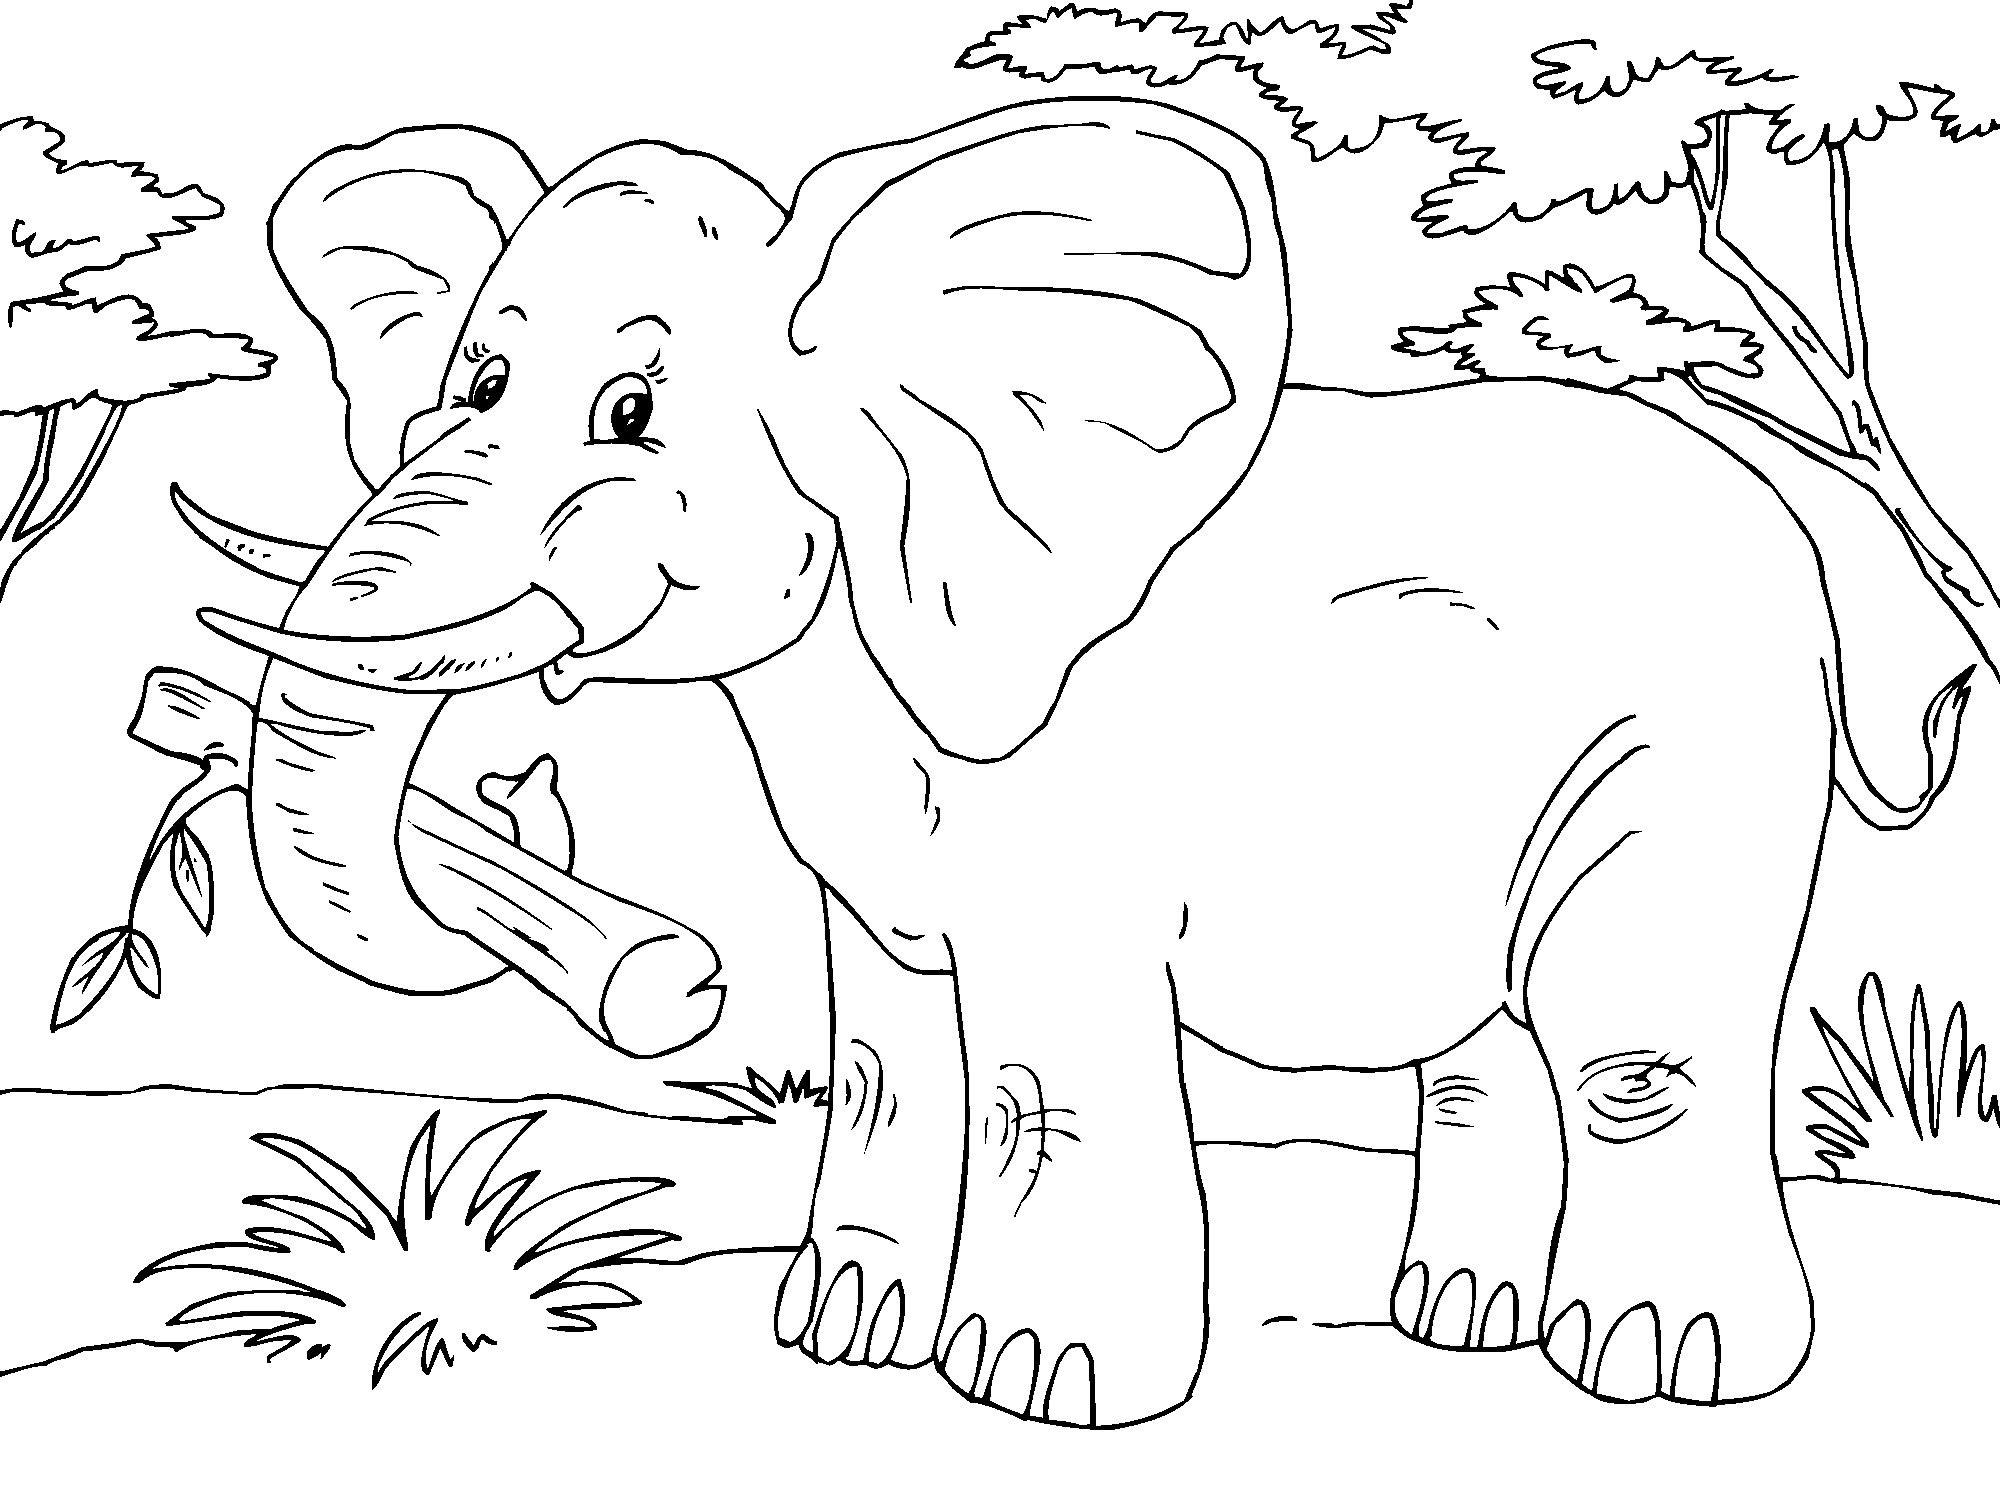 Malvorlage Elefant Ausmalbild 23015